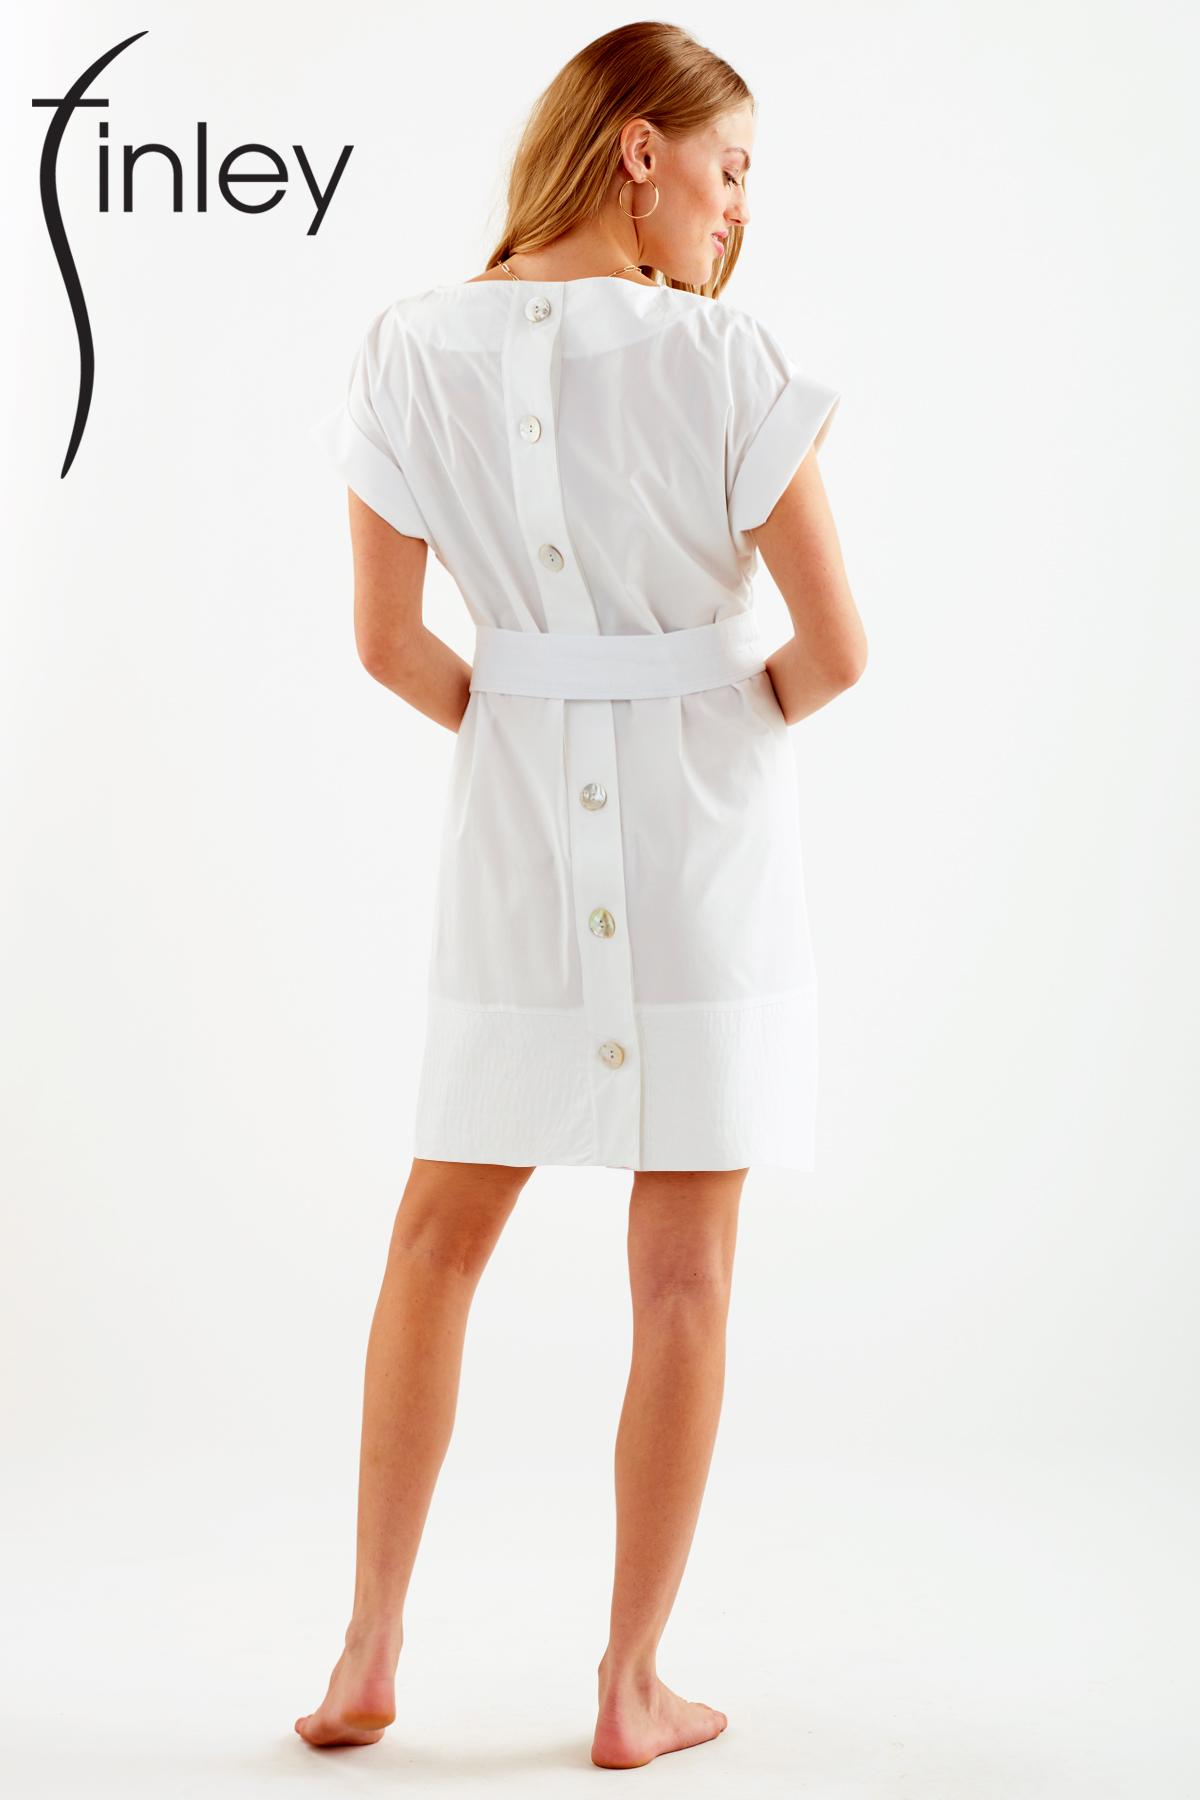 Finley Shirts Pilar Dress belted logo back